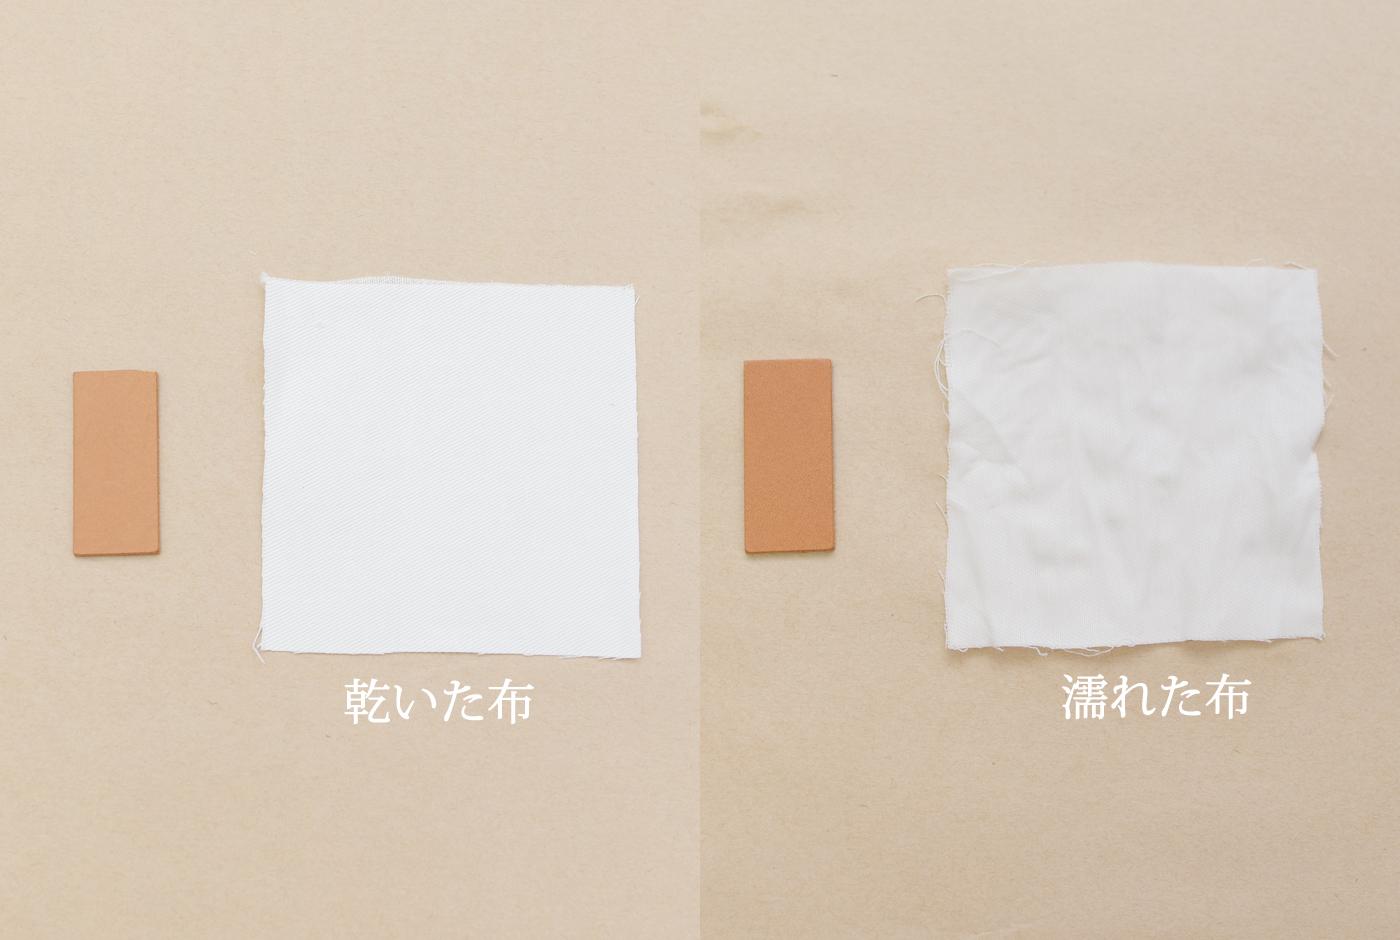 Q1、洋服が乾いている時と、濡れている時、色落ち・色移りに違いはあるの?